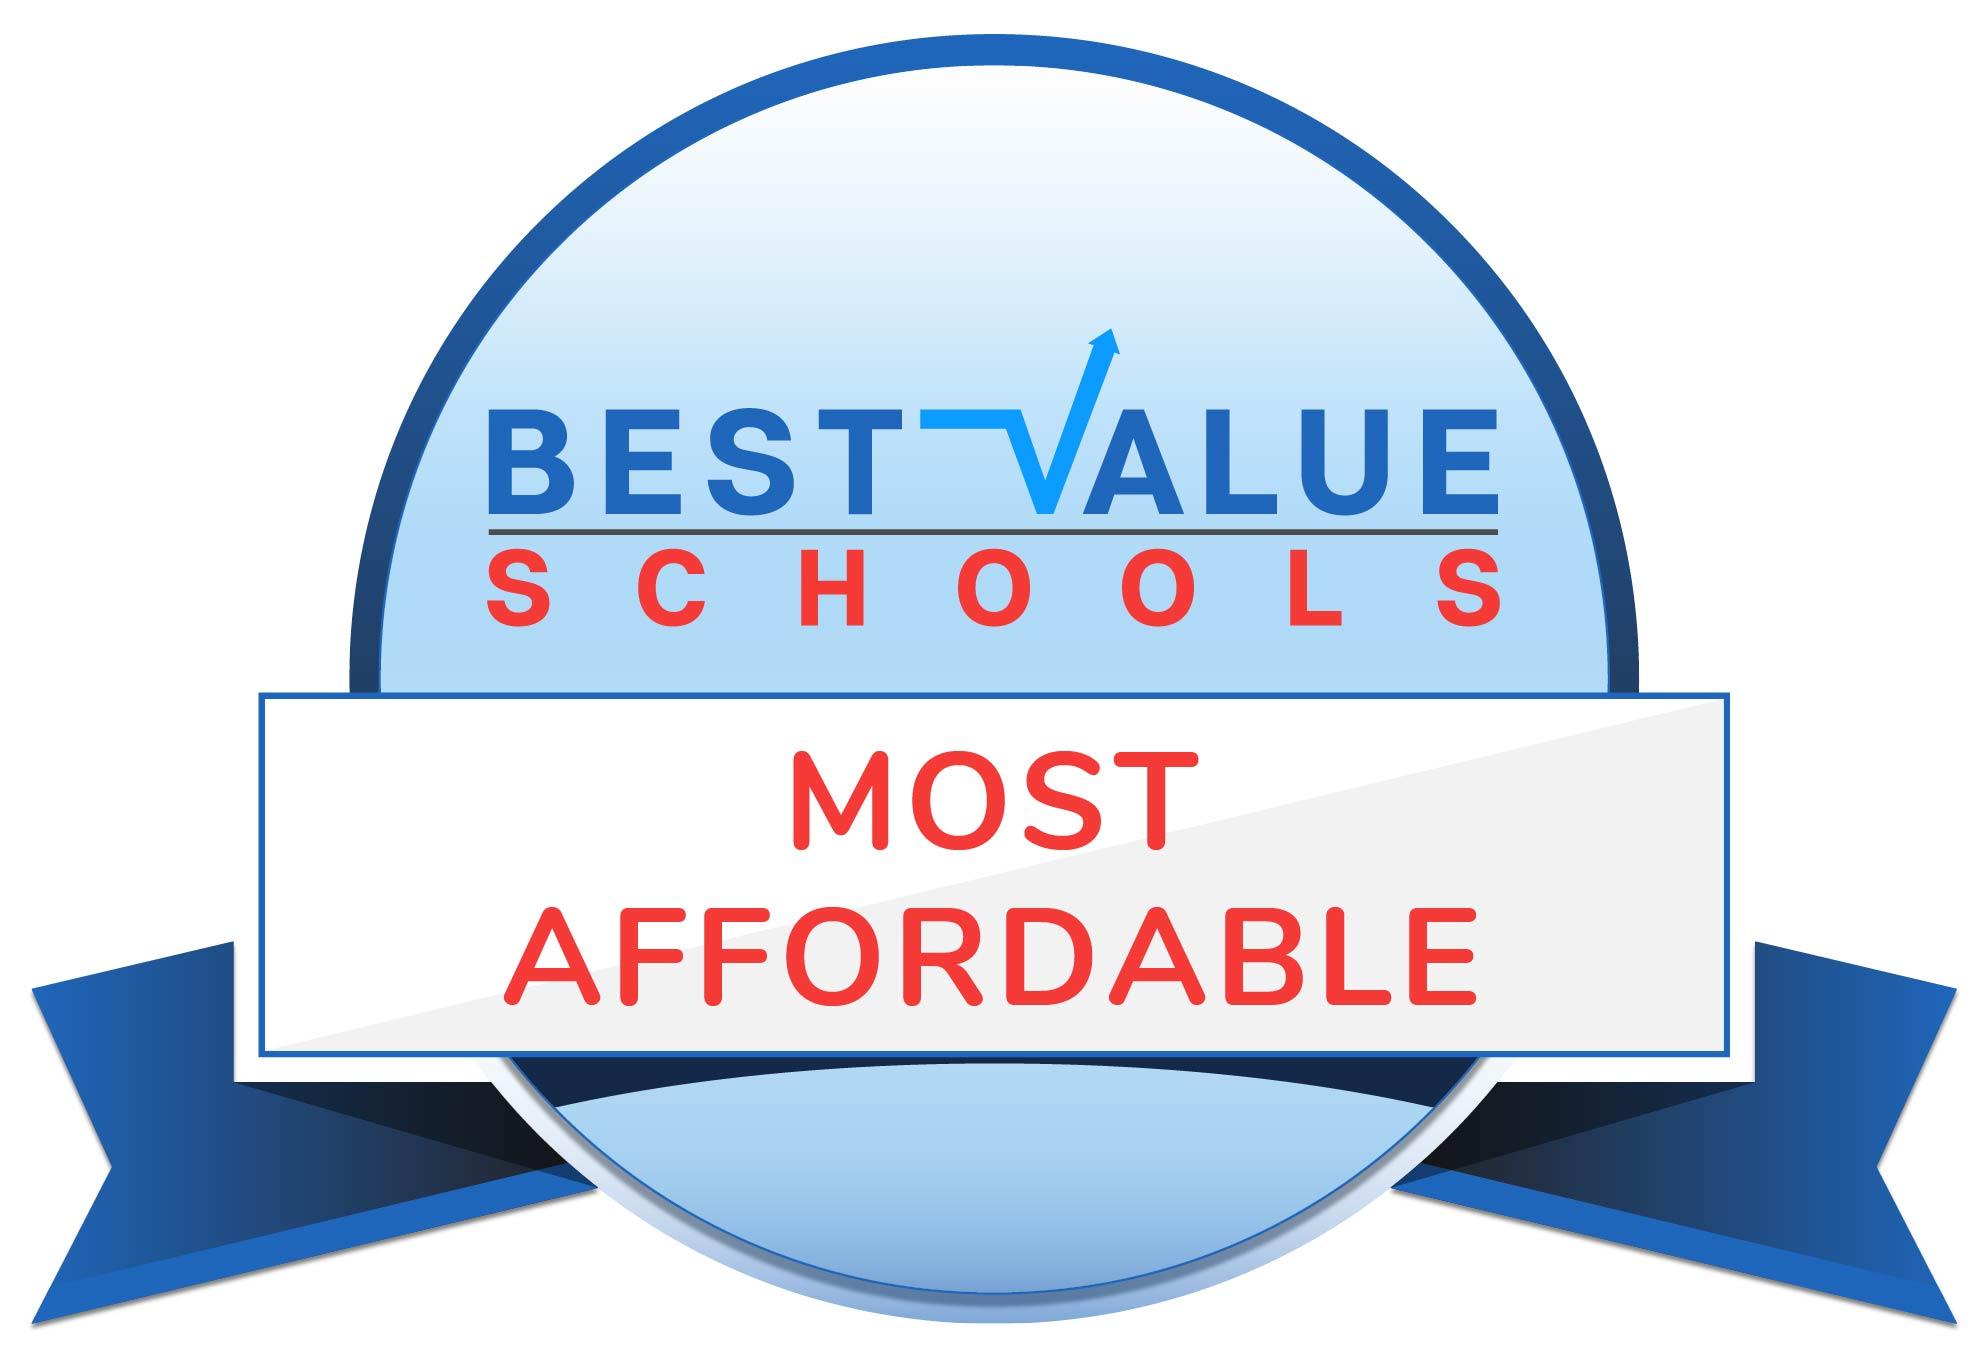 badge from bestvaluesschool.com